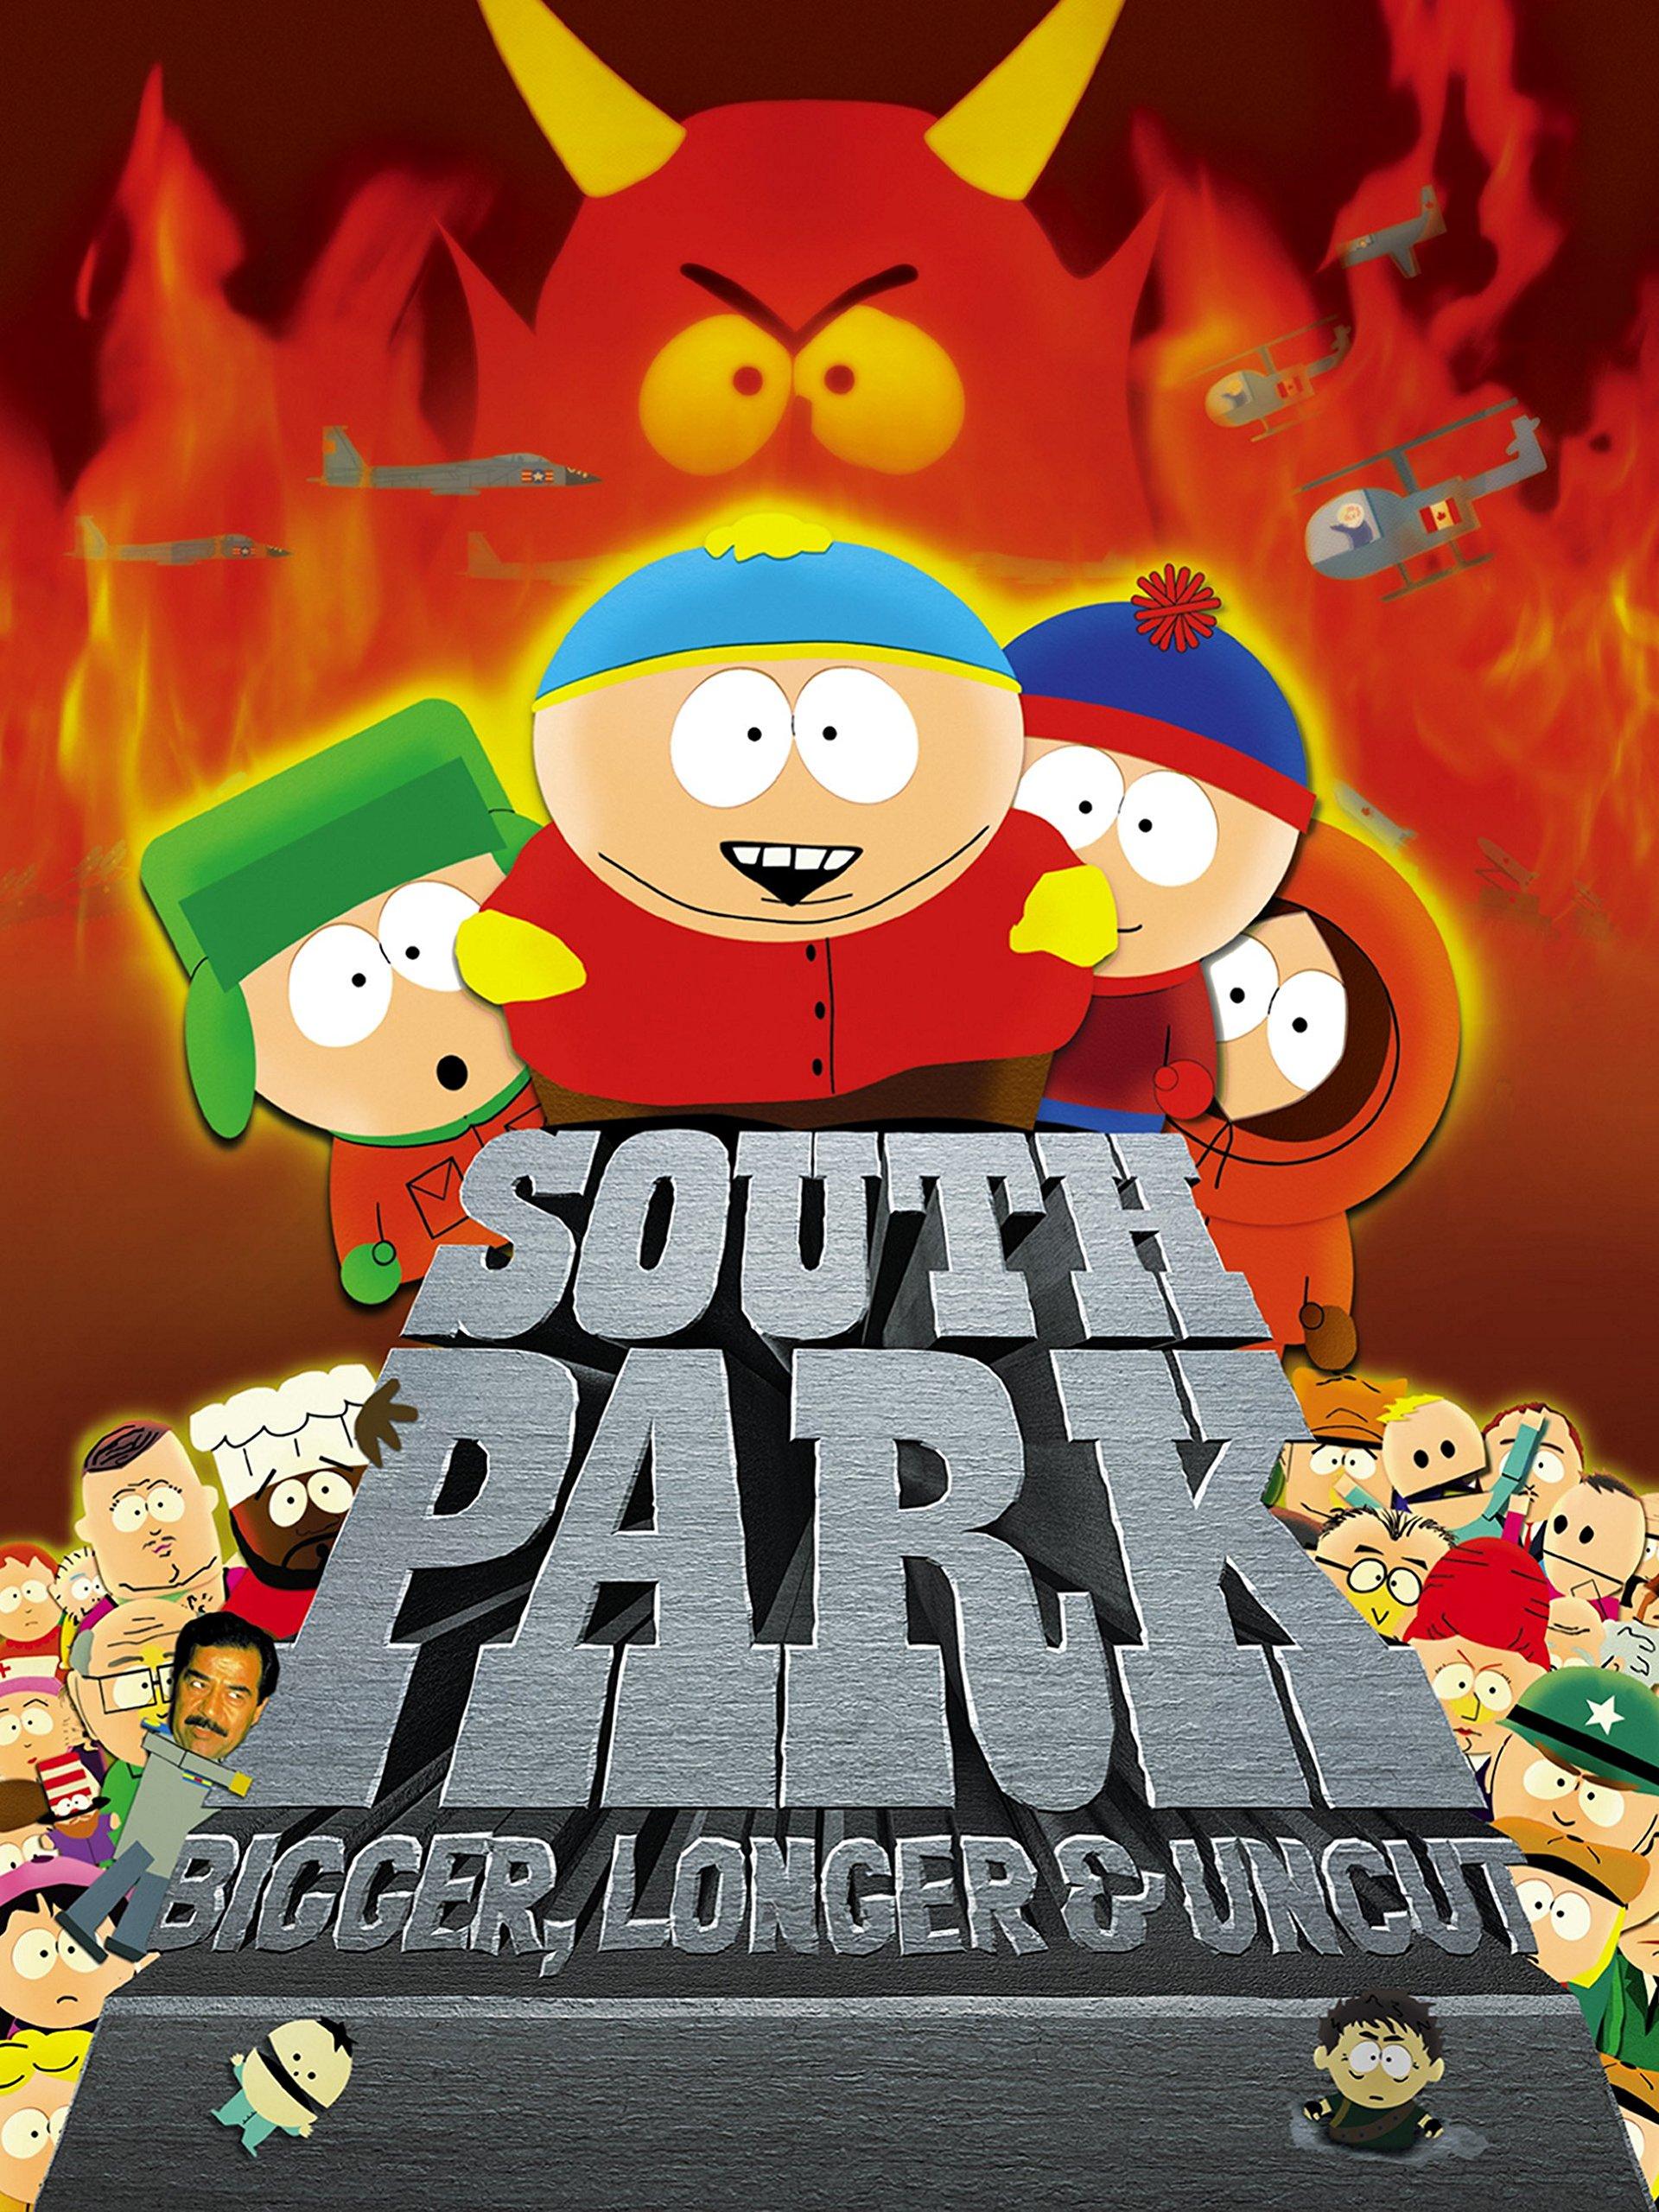 South Park - Bigger, Longer and Uncut on Amazon Prime Instant Video UK